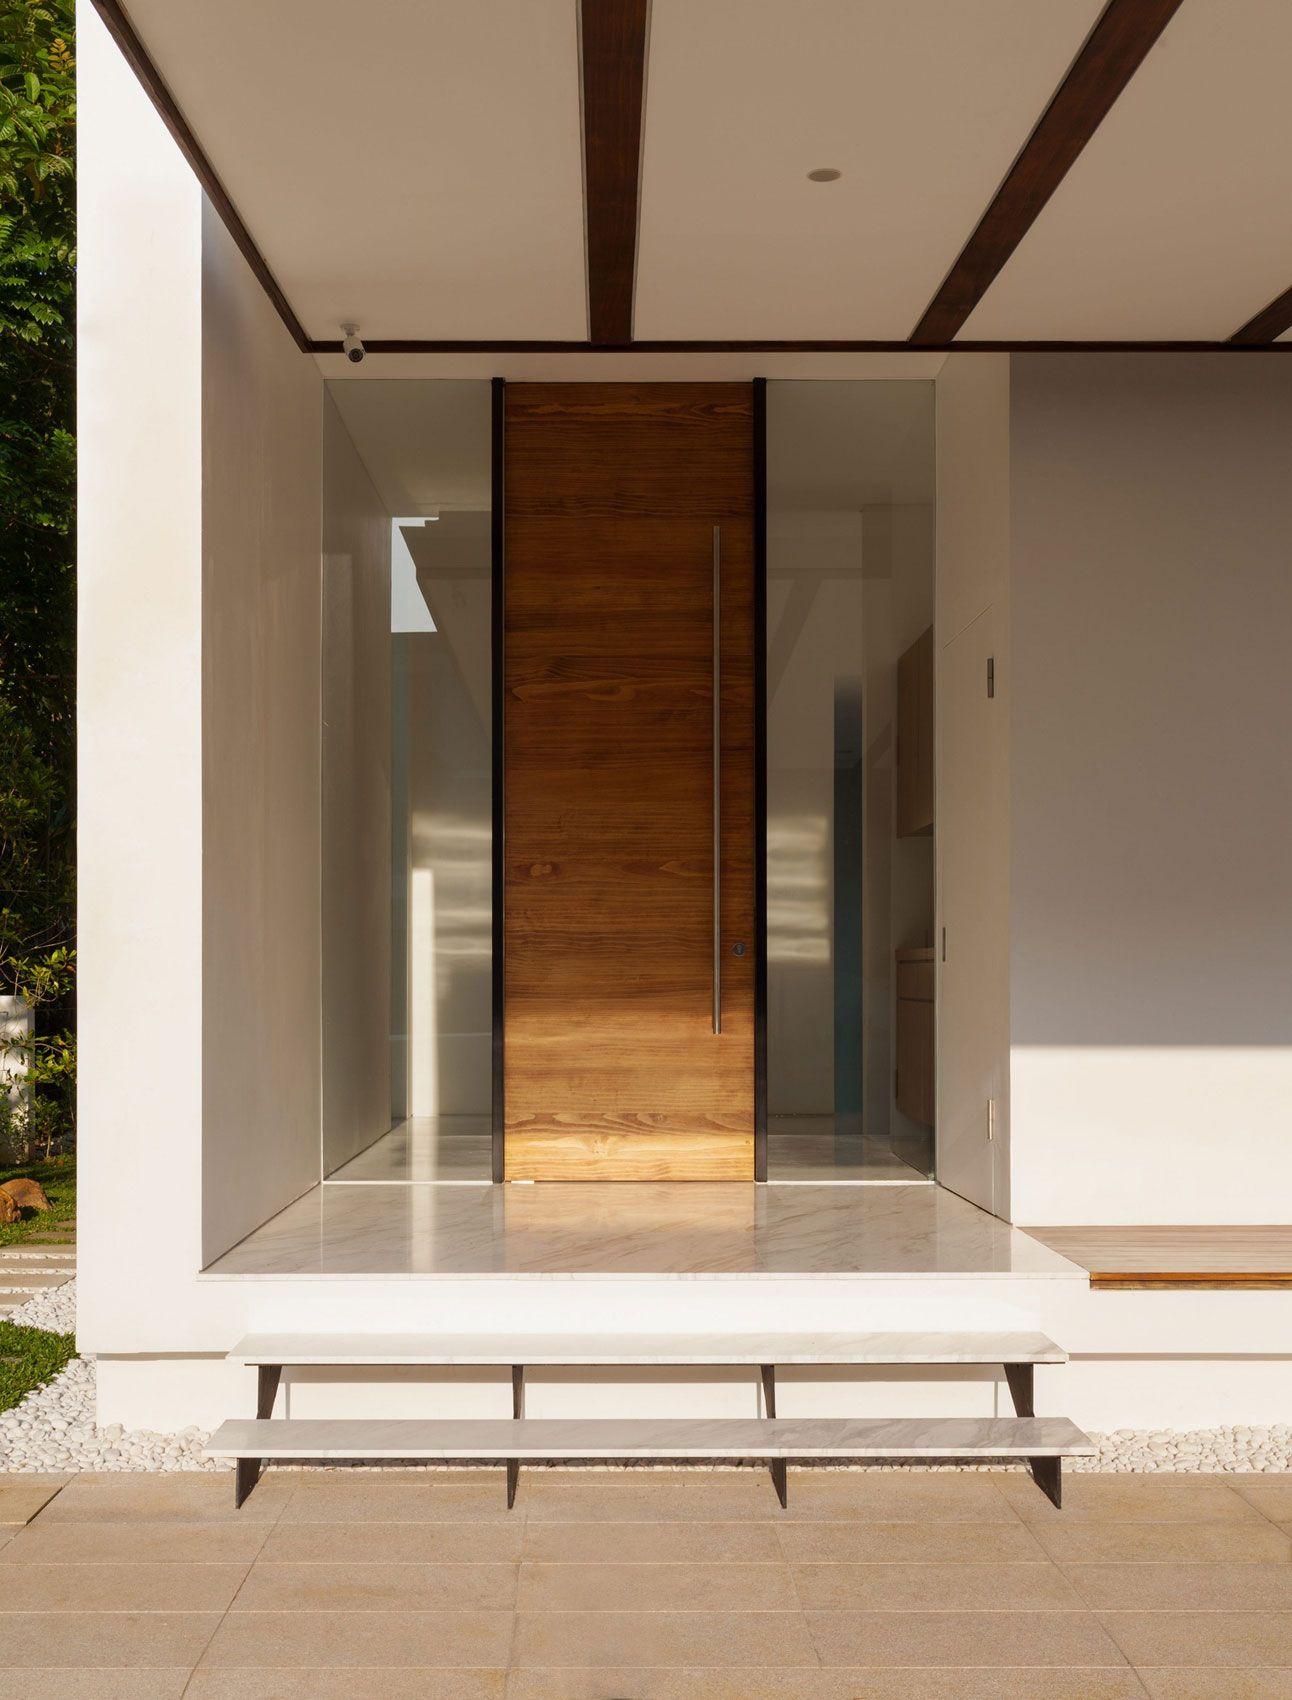 Interior Minimalist Contemporary Home Interior Design With